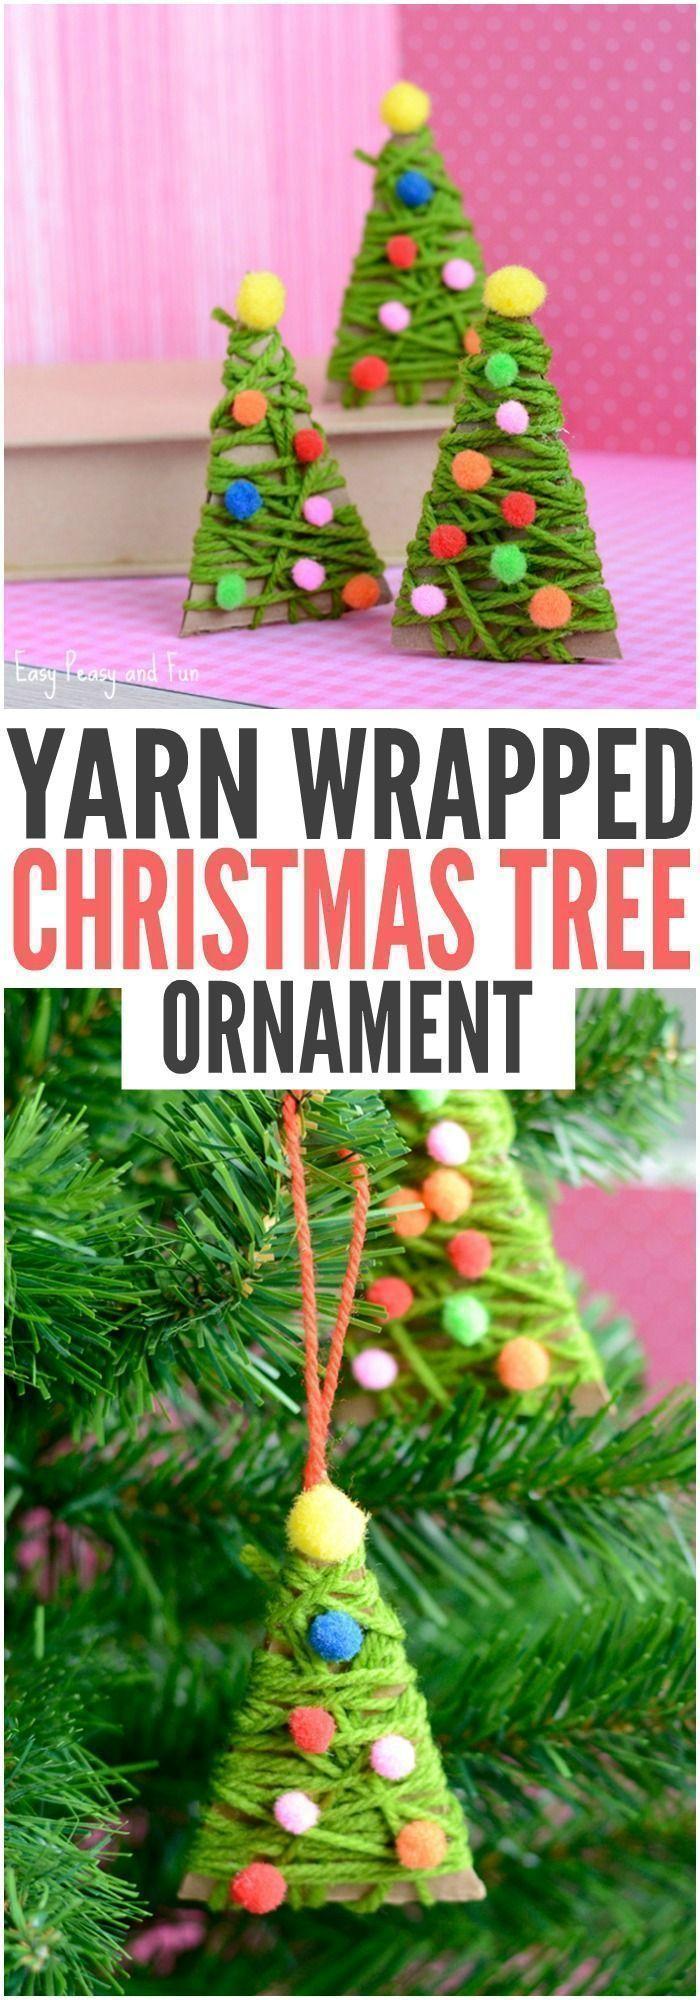 DIY Yarn Wrapped Christmas Tree Ornament. Pretty Christmas Ornaments for Kids to Make!